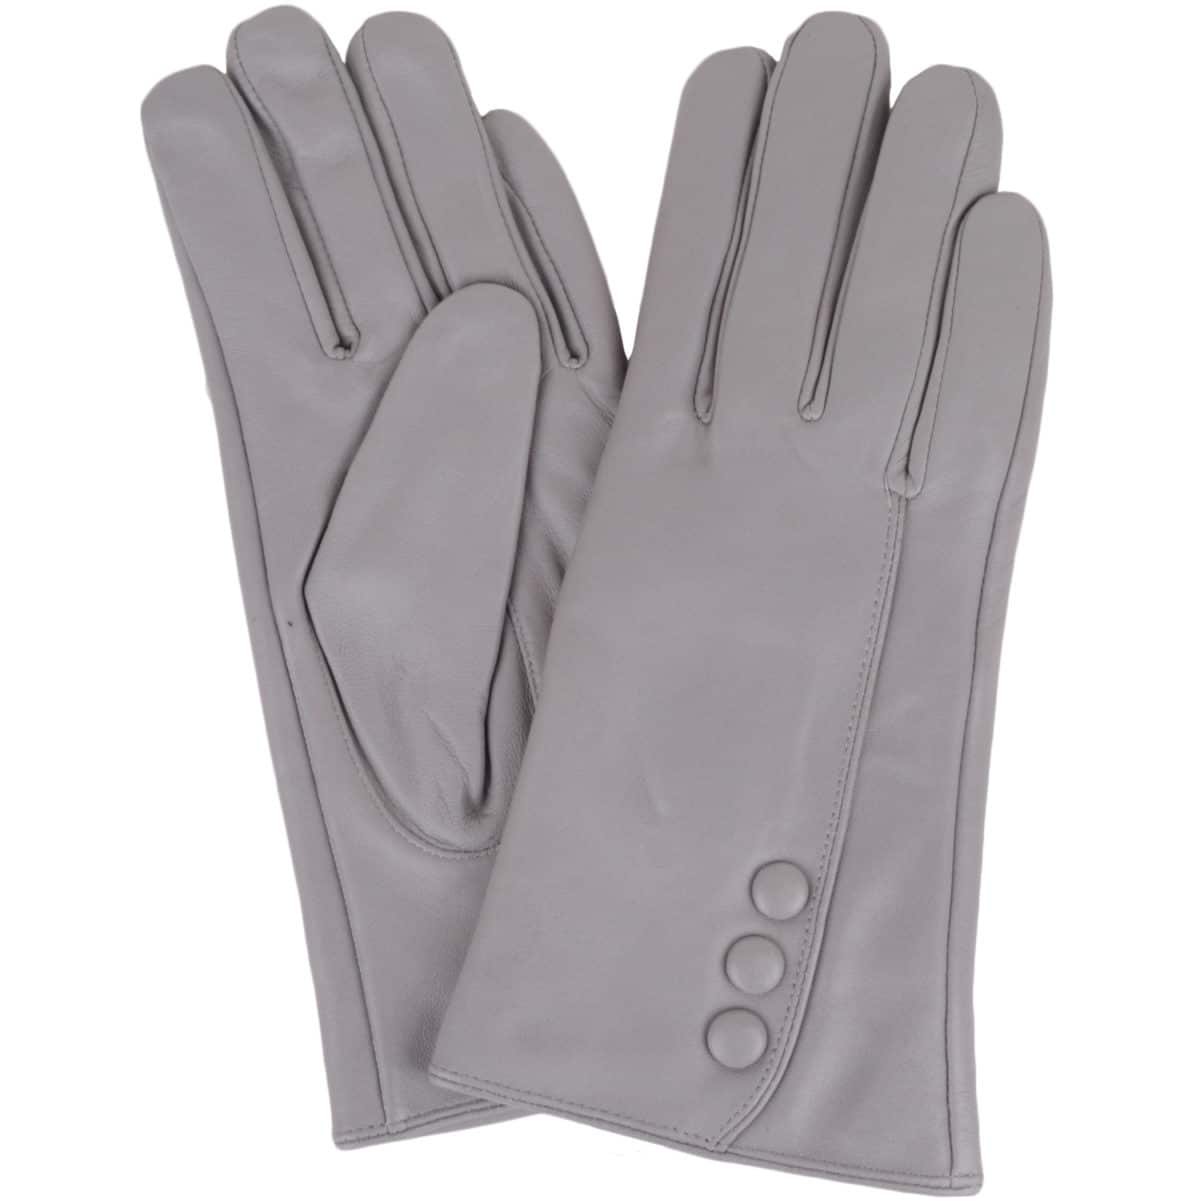 Rhian - Leather Gloves Triple Button Feature - Grey